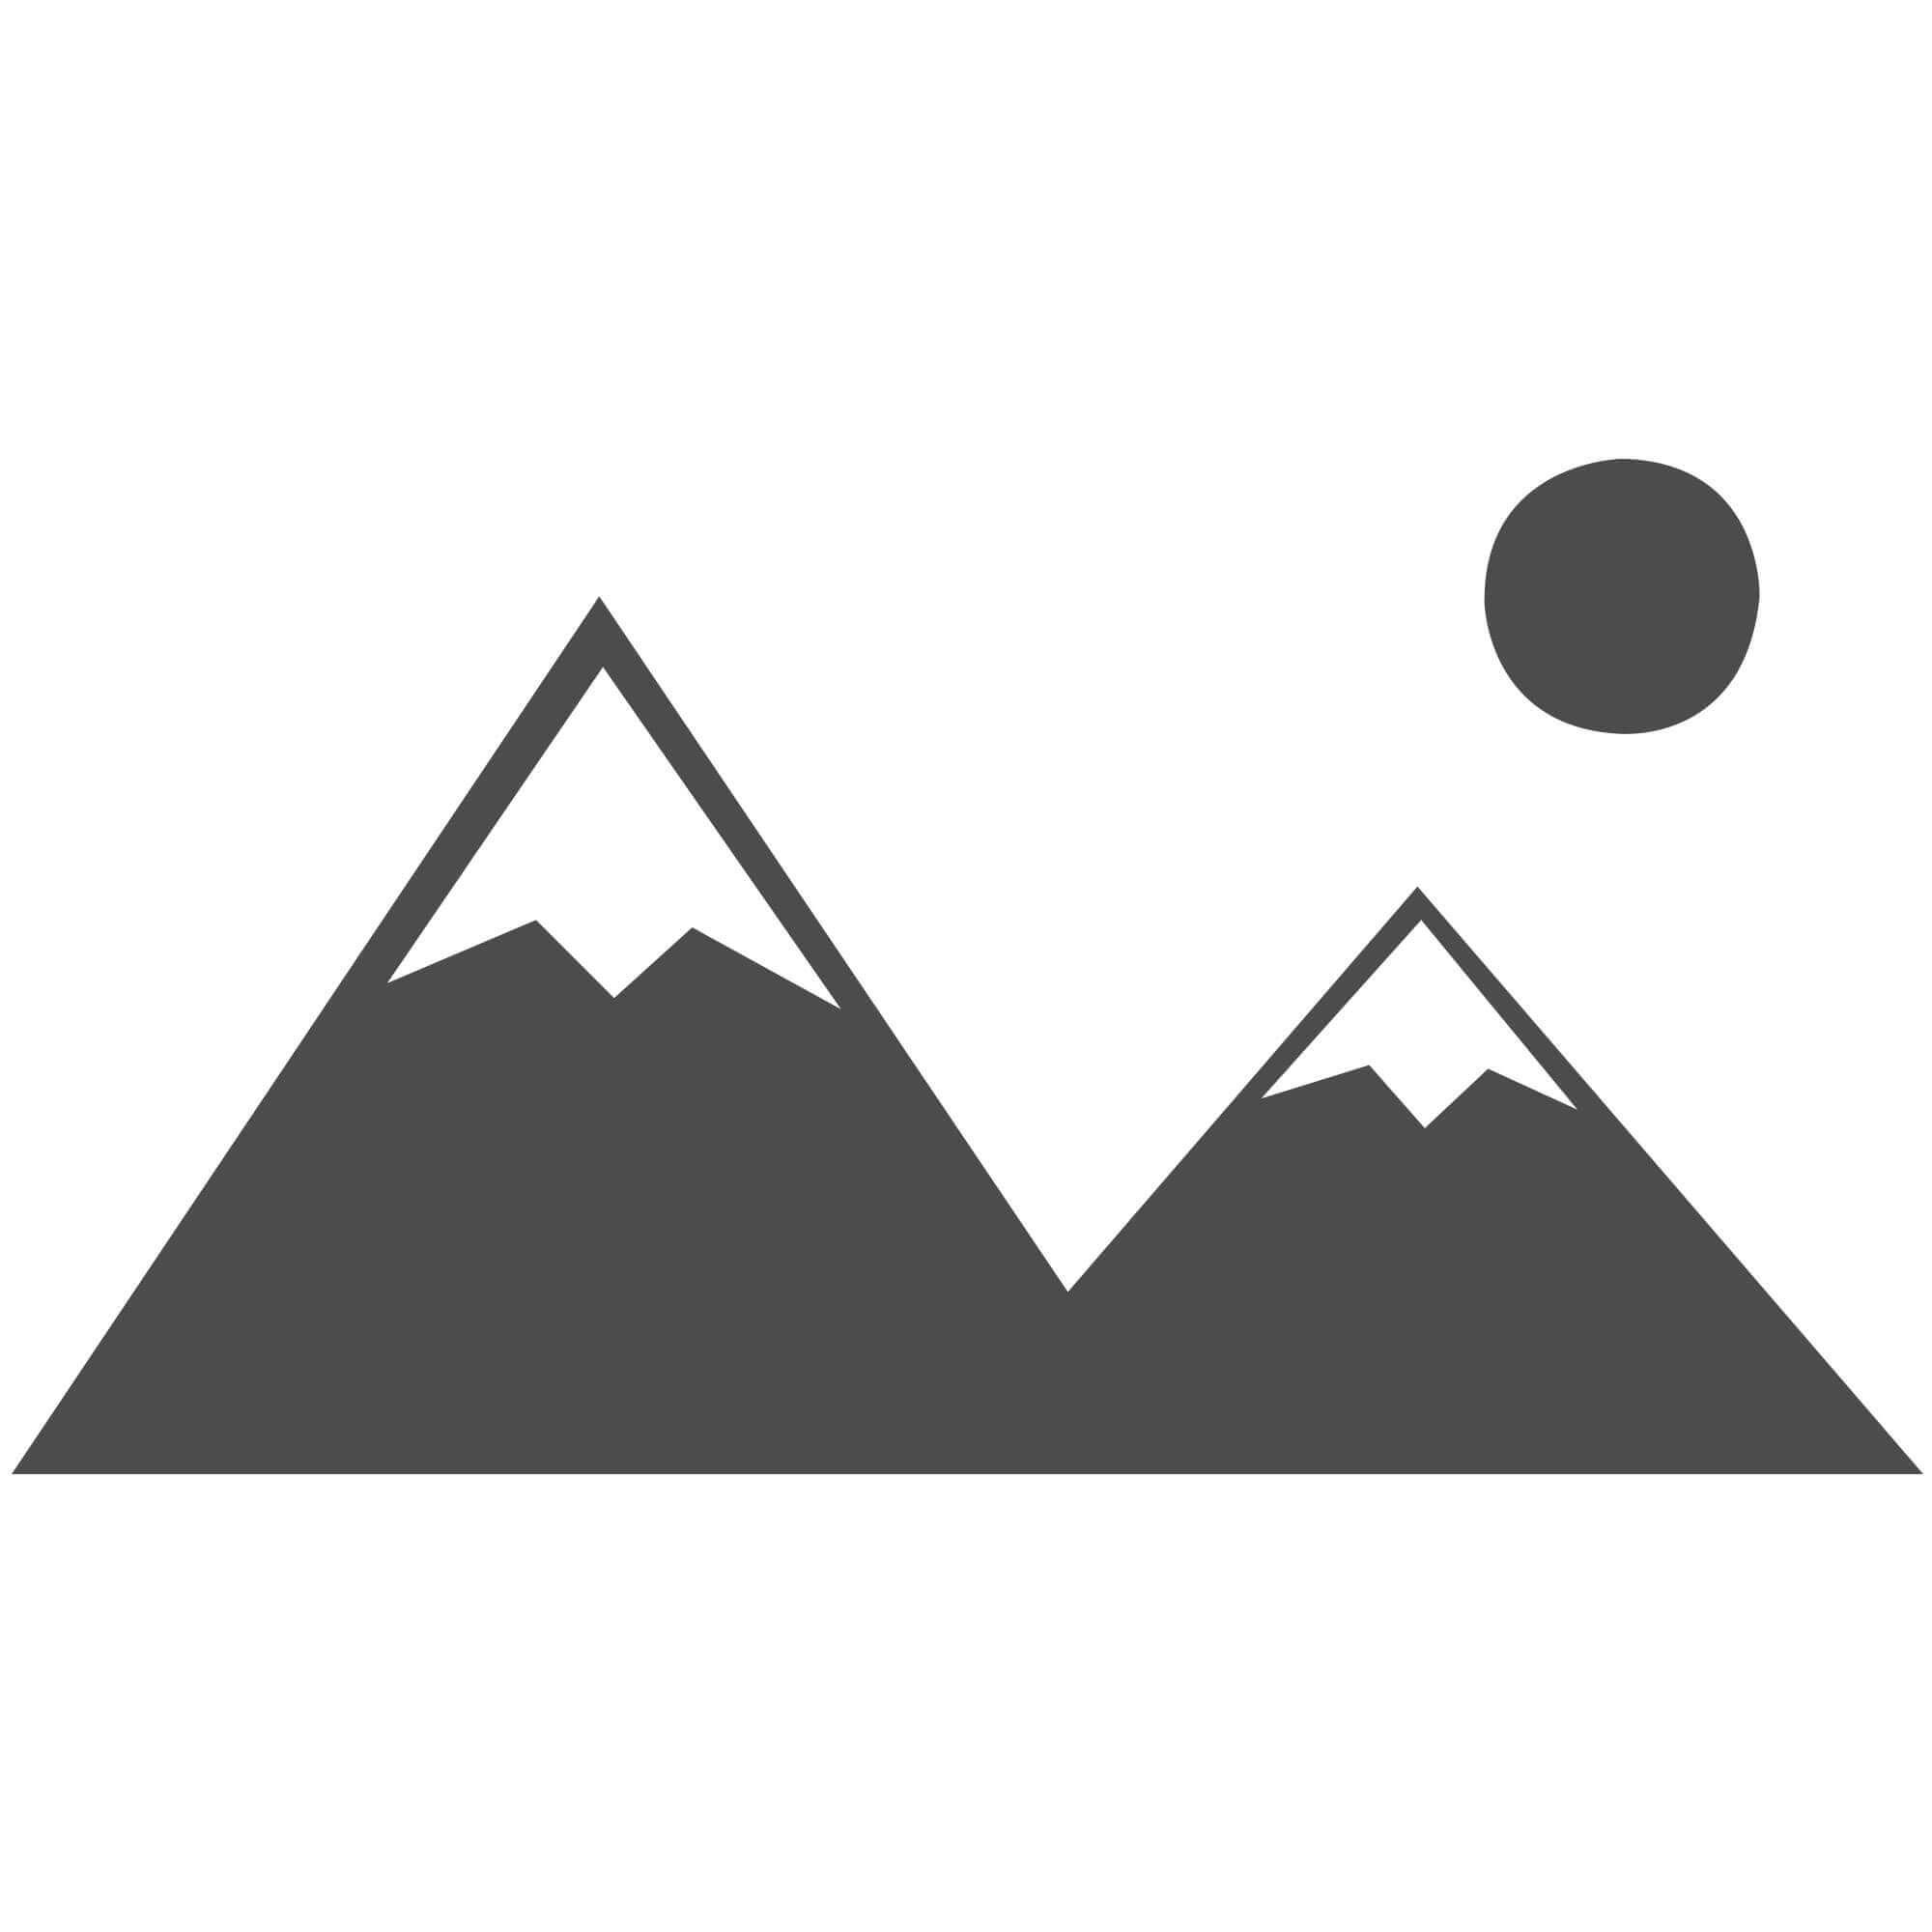 Chateau limestone fireplace with lights #FPW